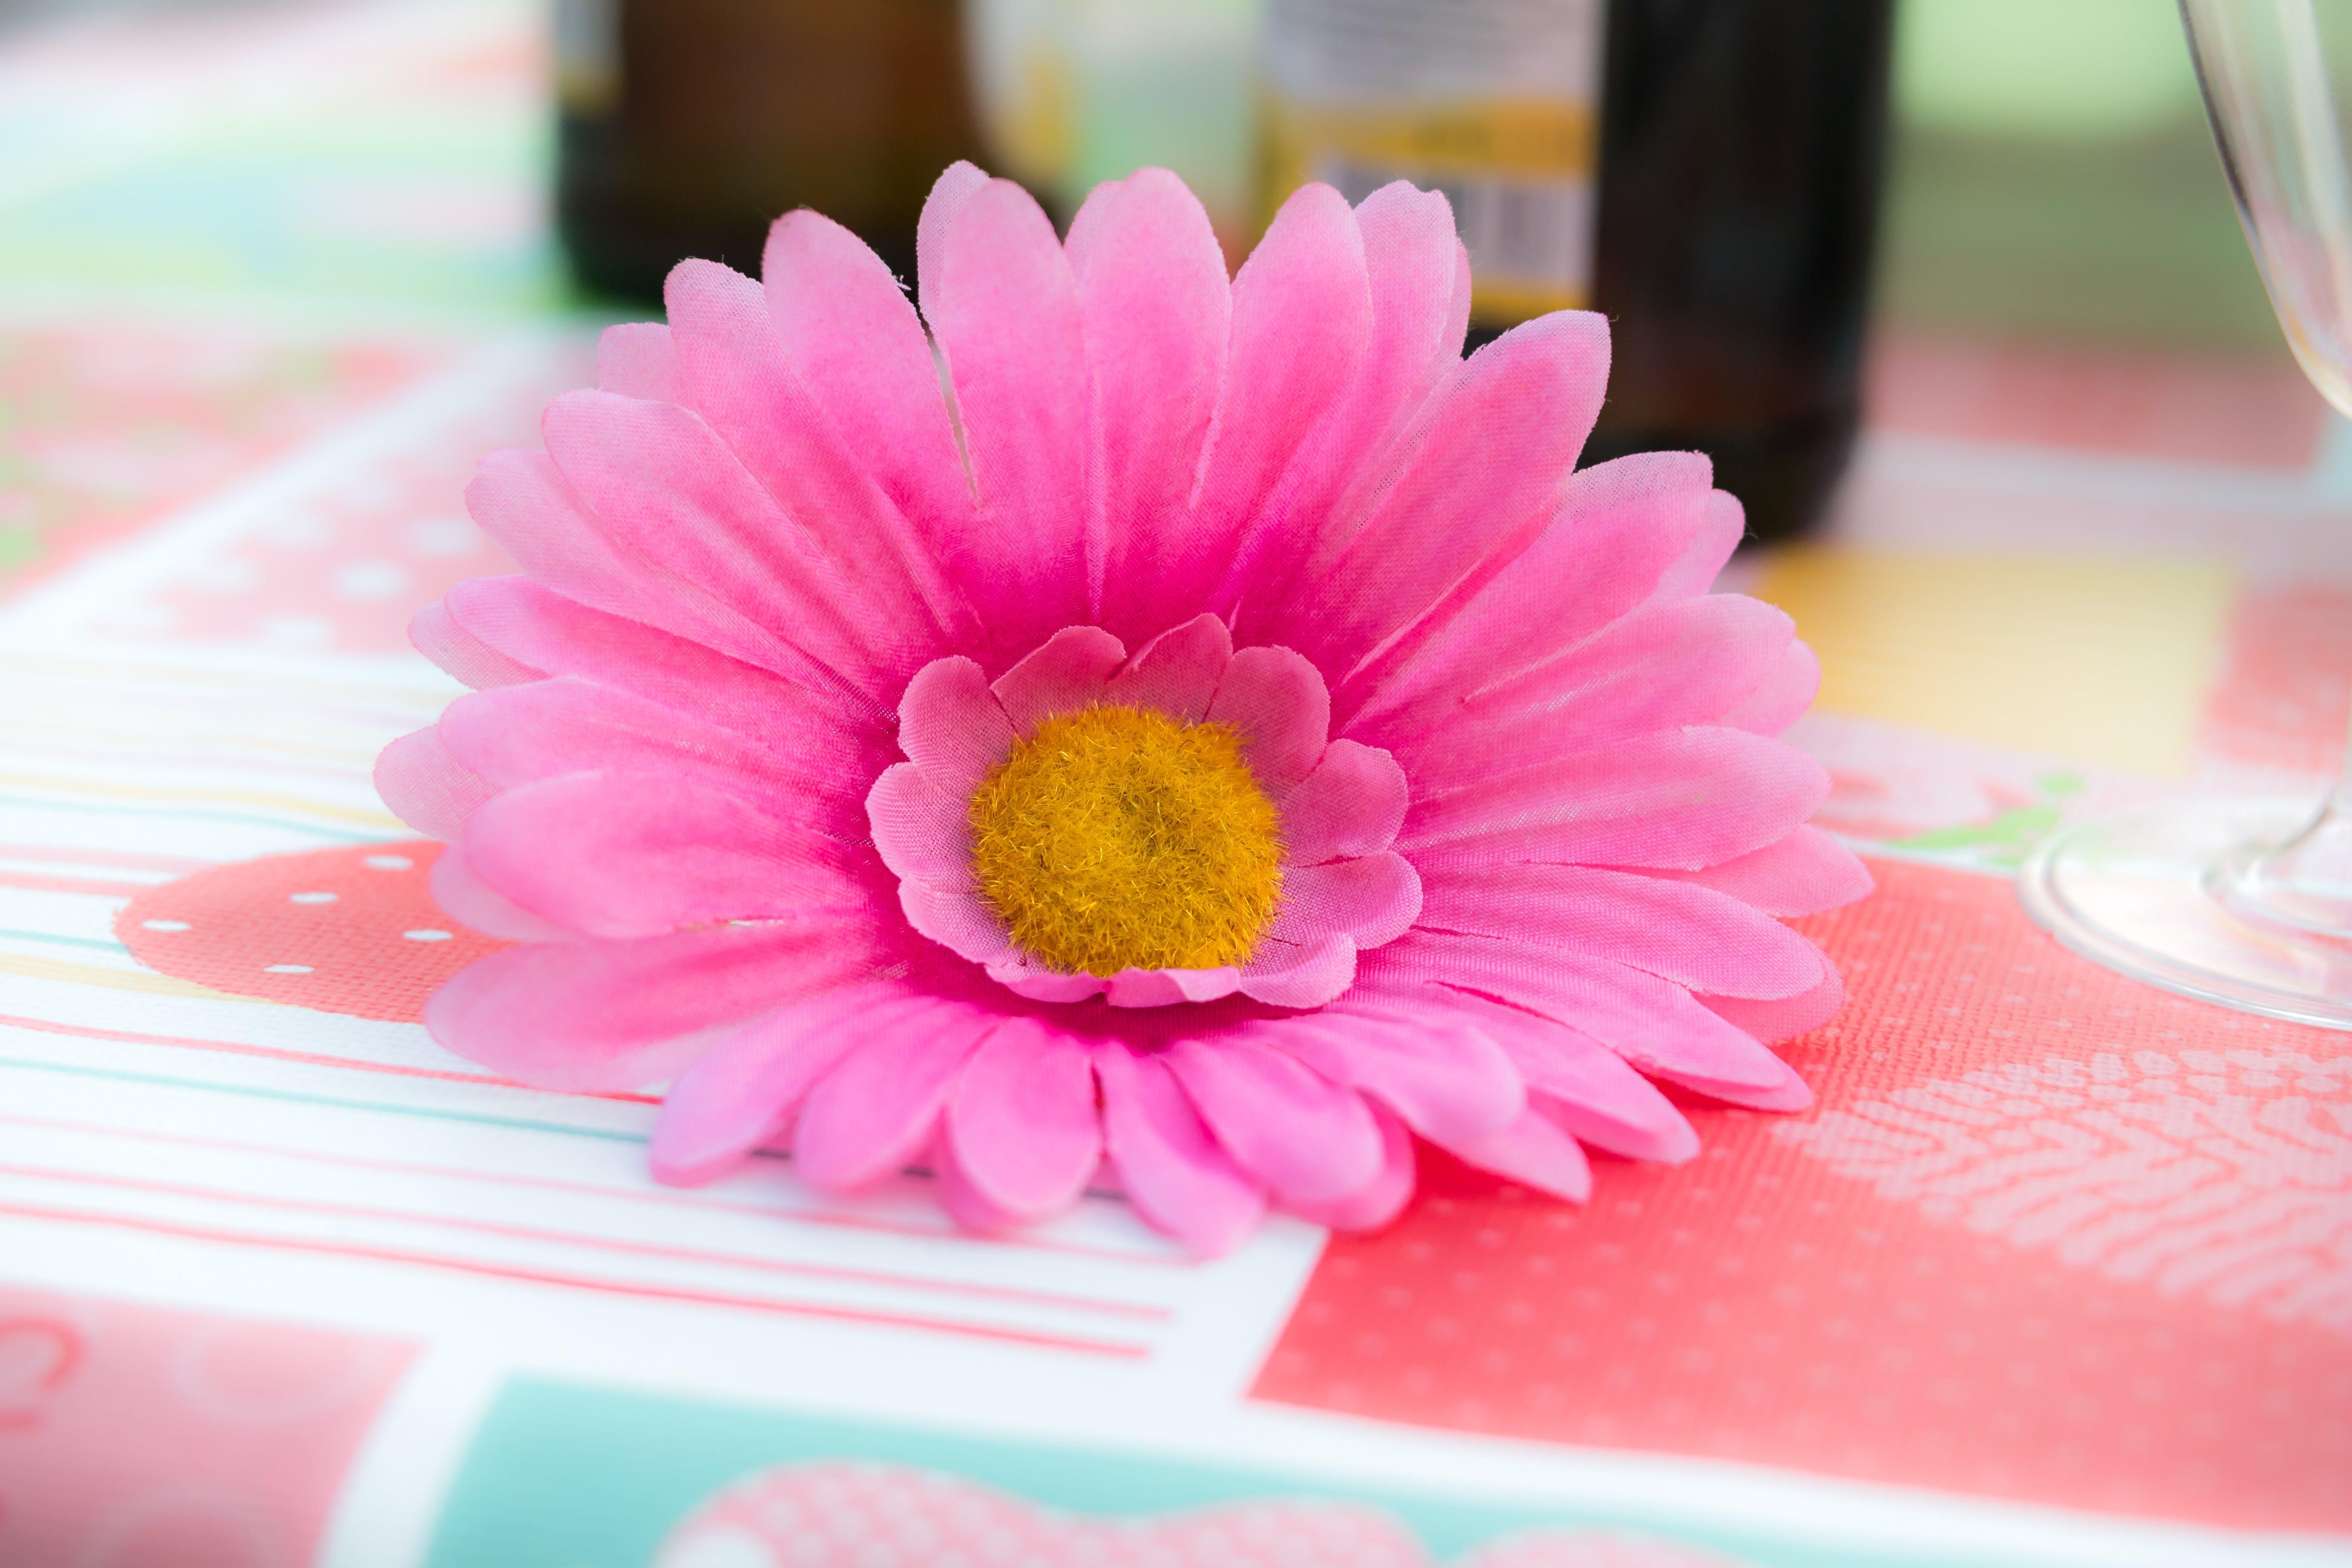 Free stock photo of birthday, bloom, blossom, celebration